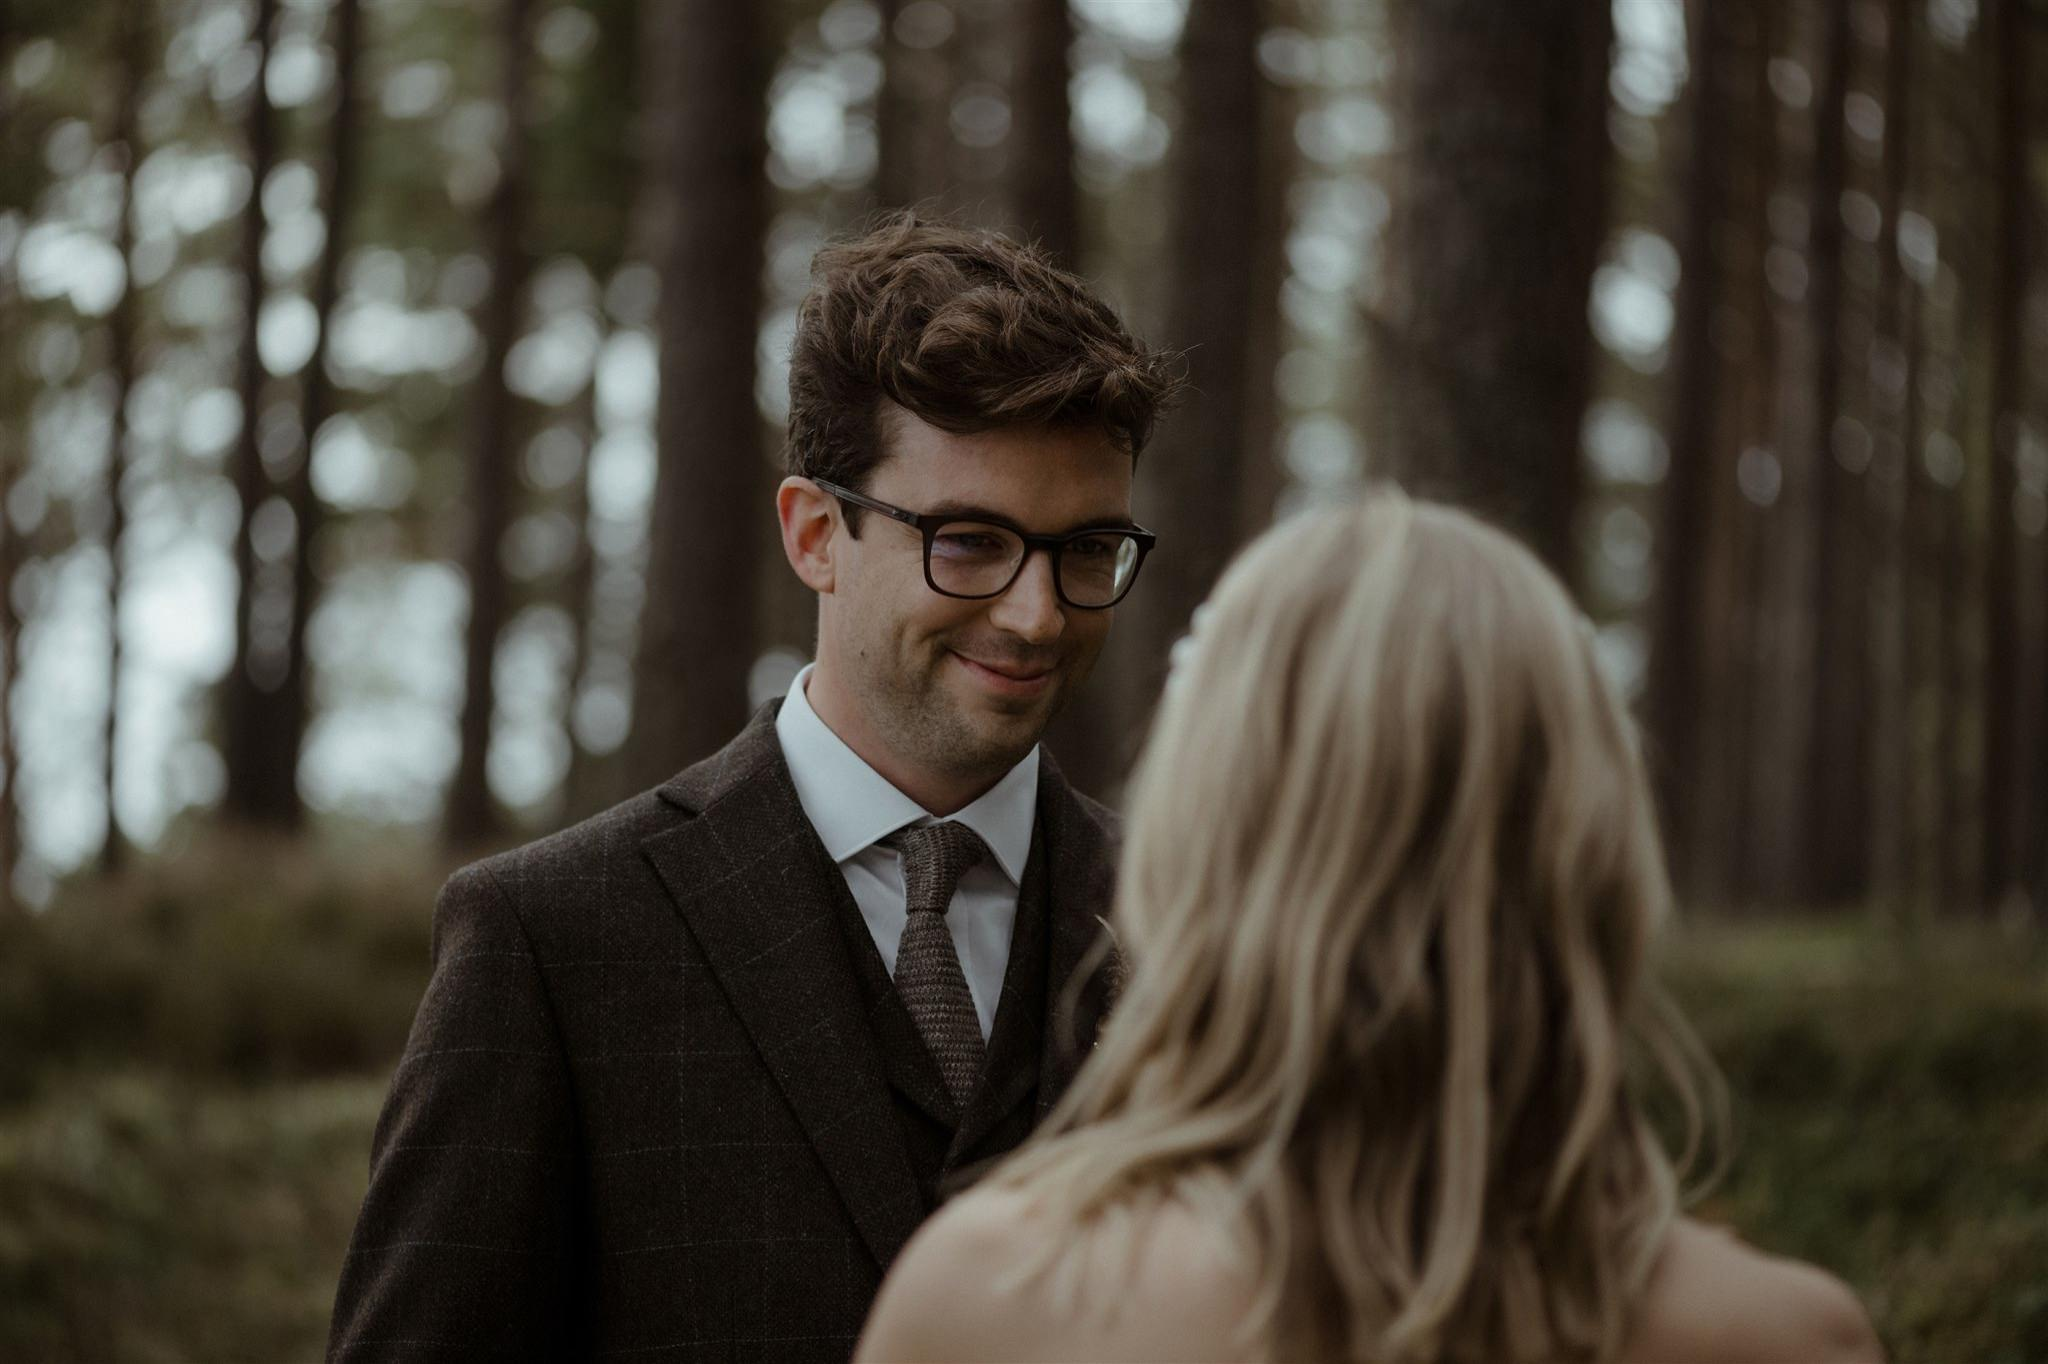 Bride and groom at woodland elopement ceremony at Loch Garten